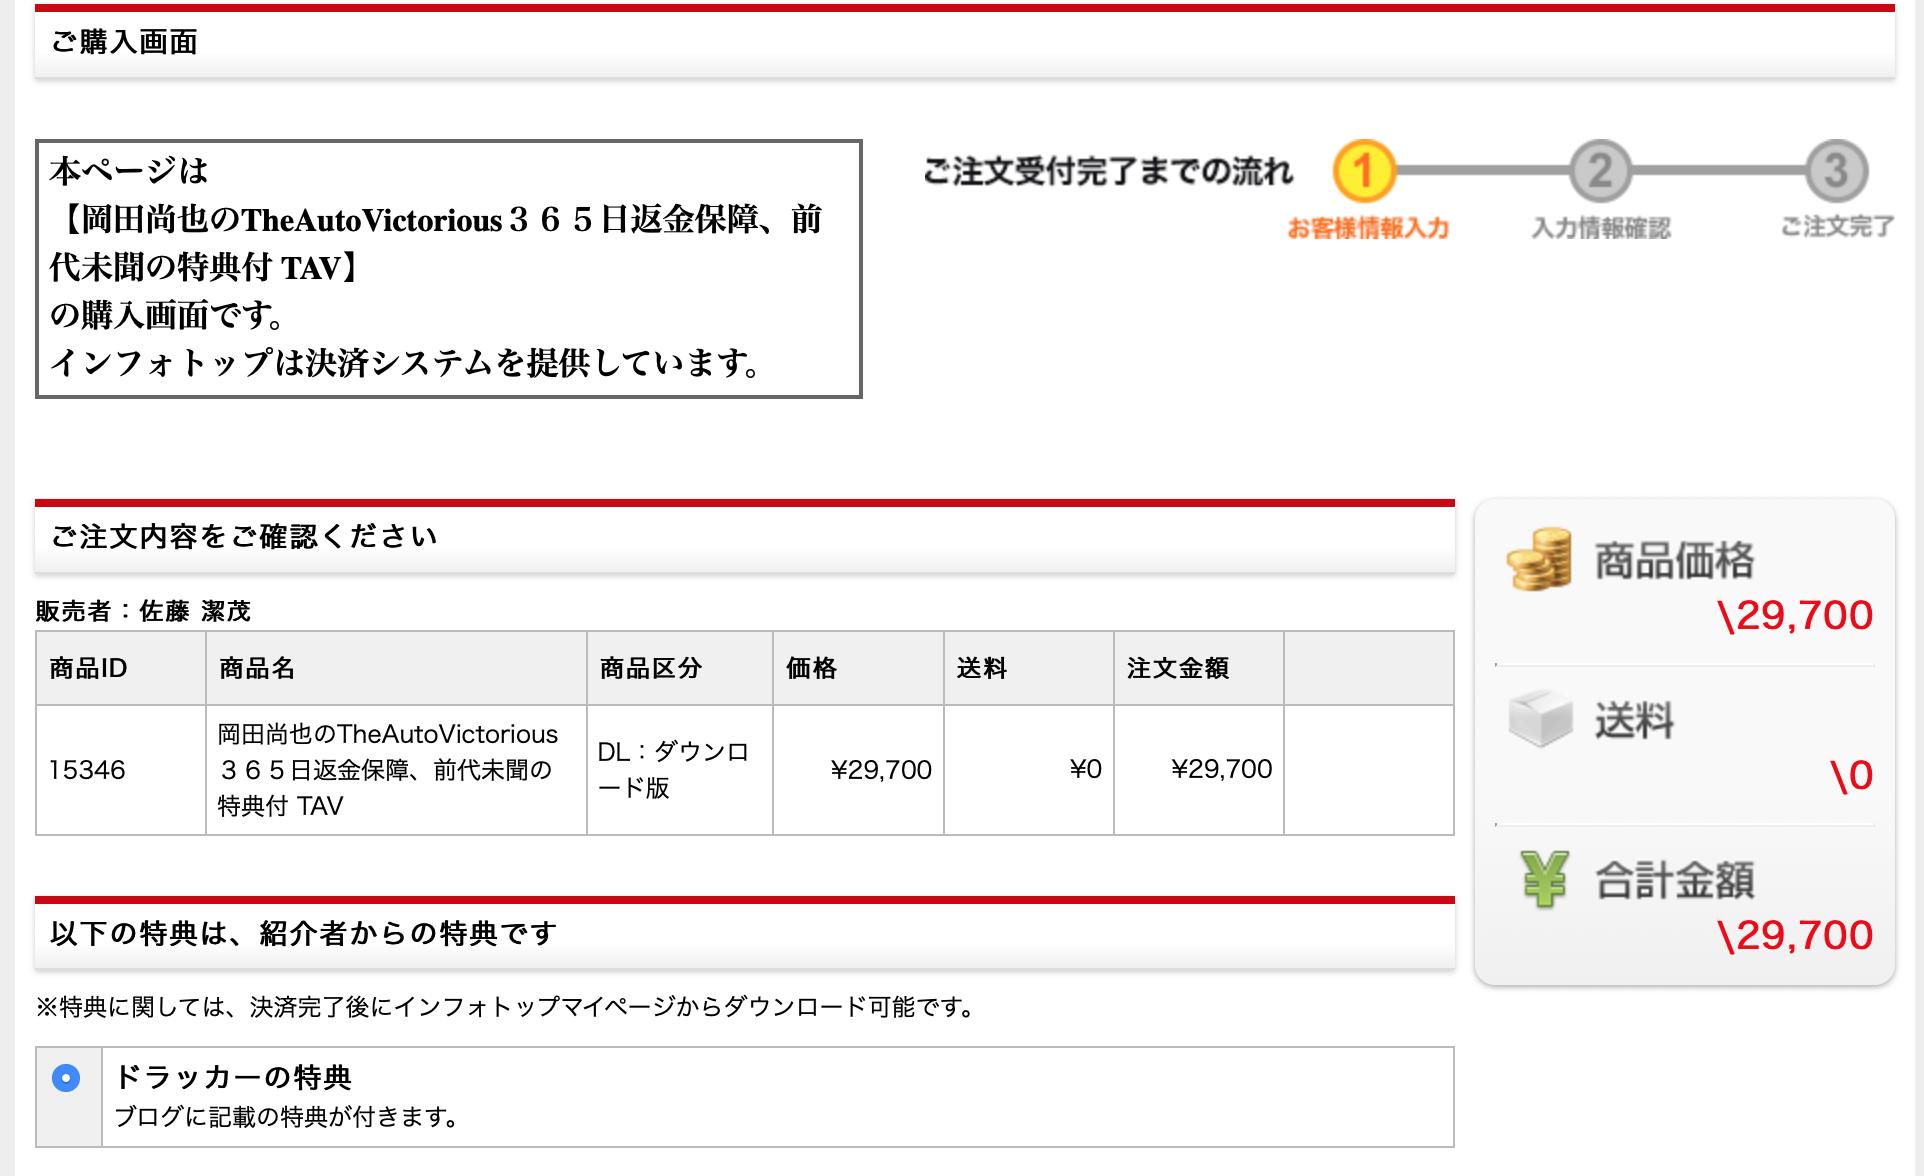 岡田尚也のTAV購入画面